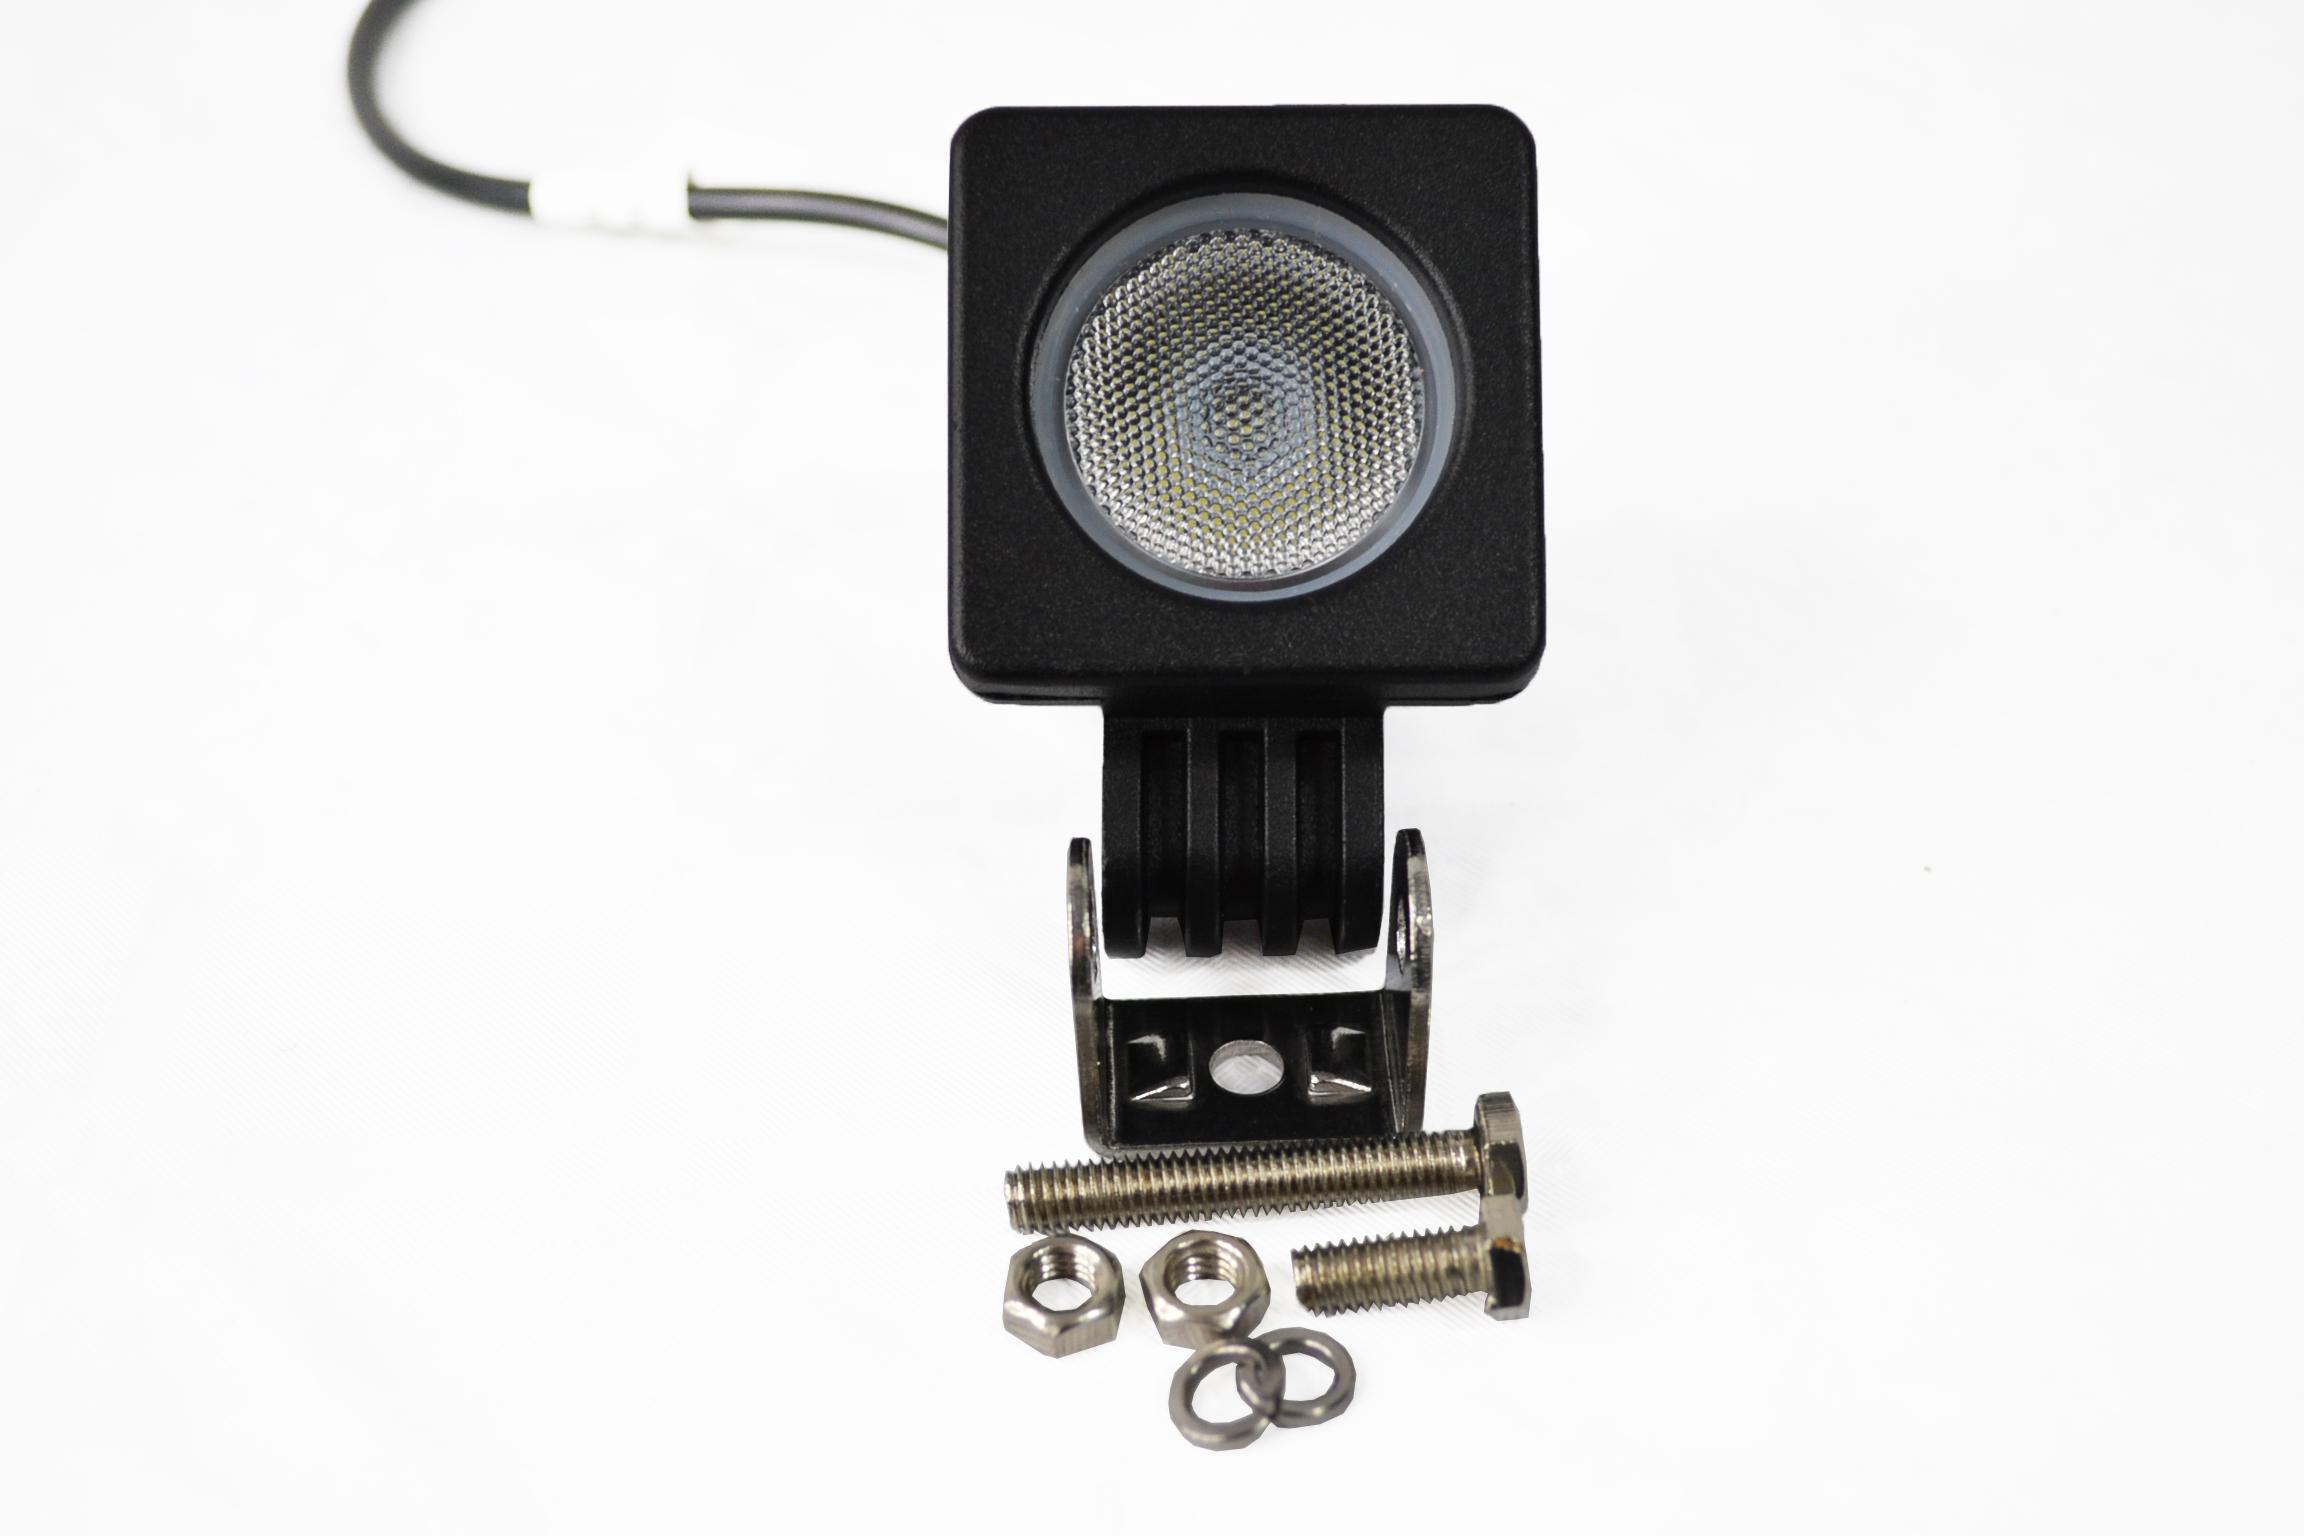 LAMPA ROBOCZA LED HALOGEN 10W 12V 24V MOCNA FLOOD